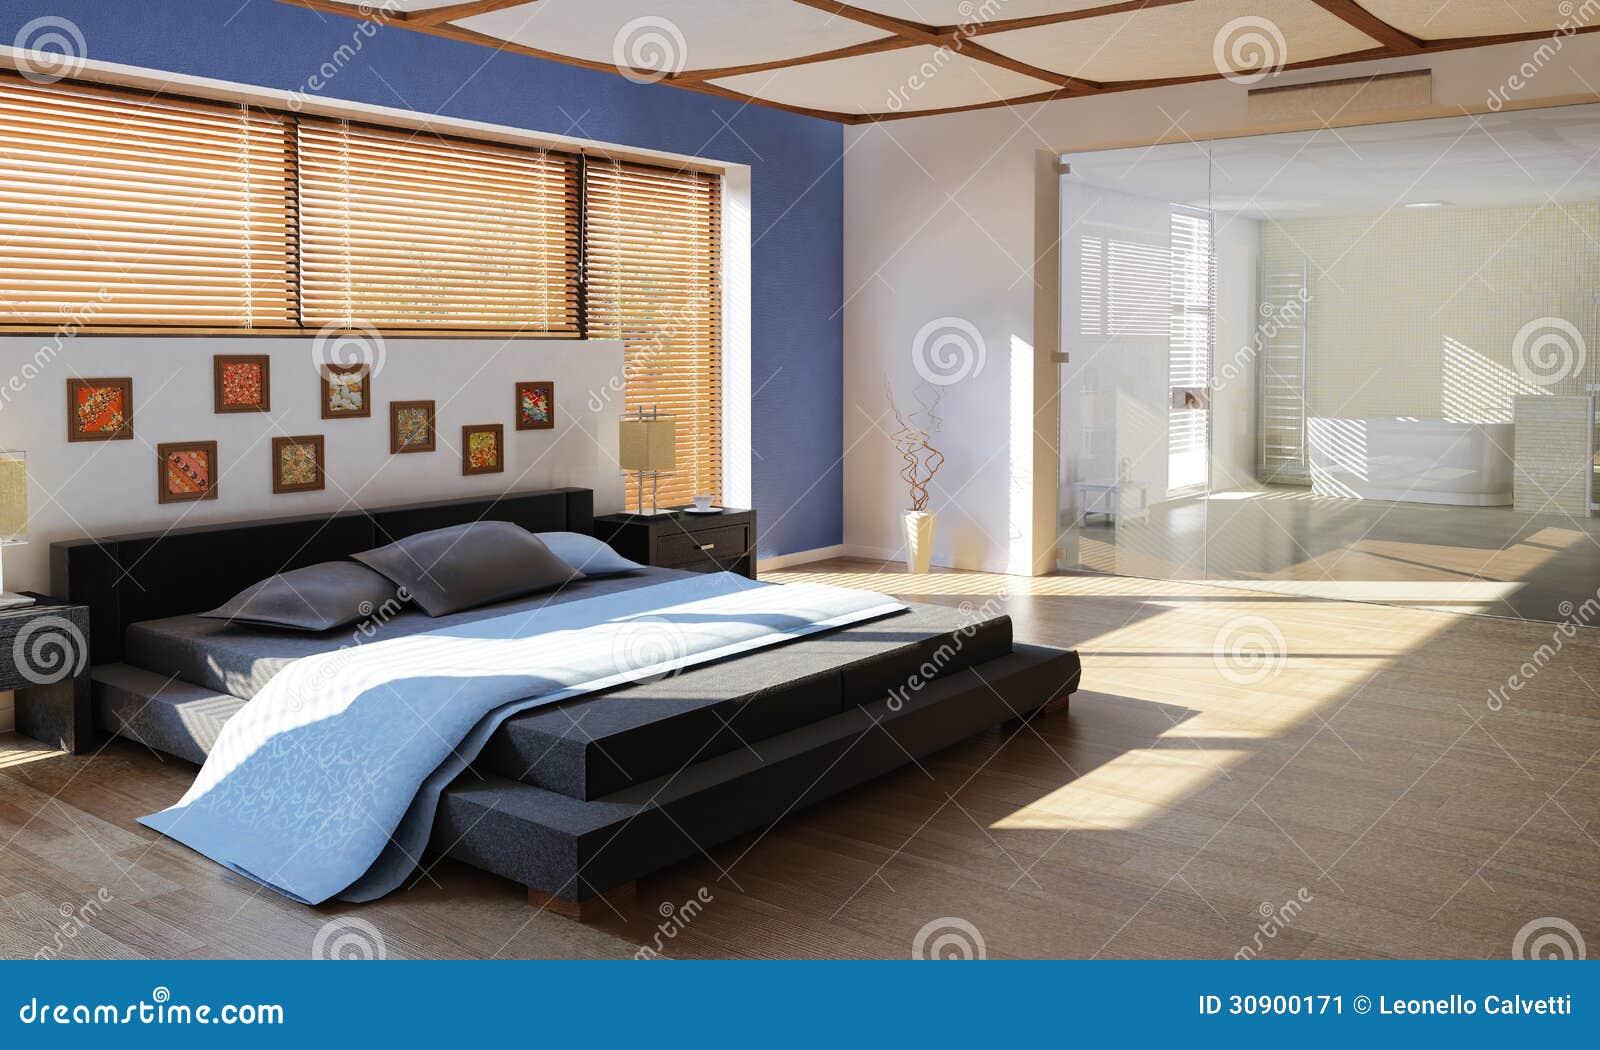 chambre a coucher luxe avec des id es. Black Bedroom Furniture Sets. Home Design Ideas